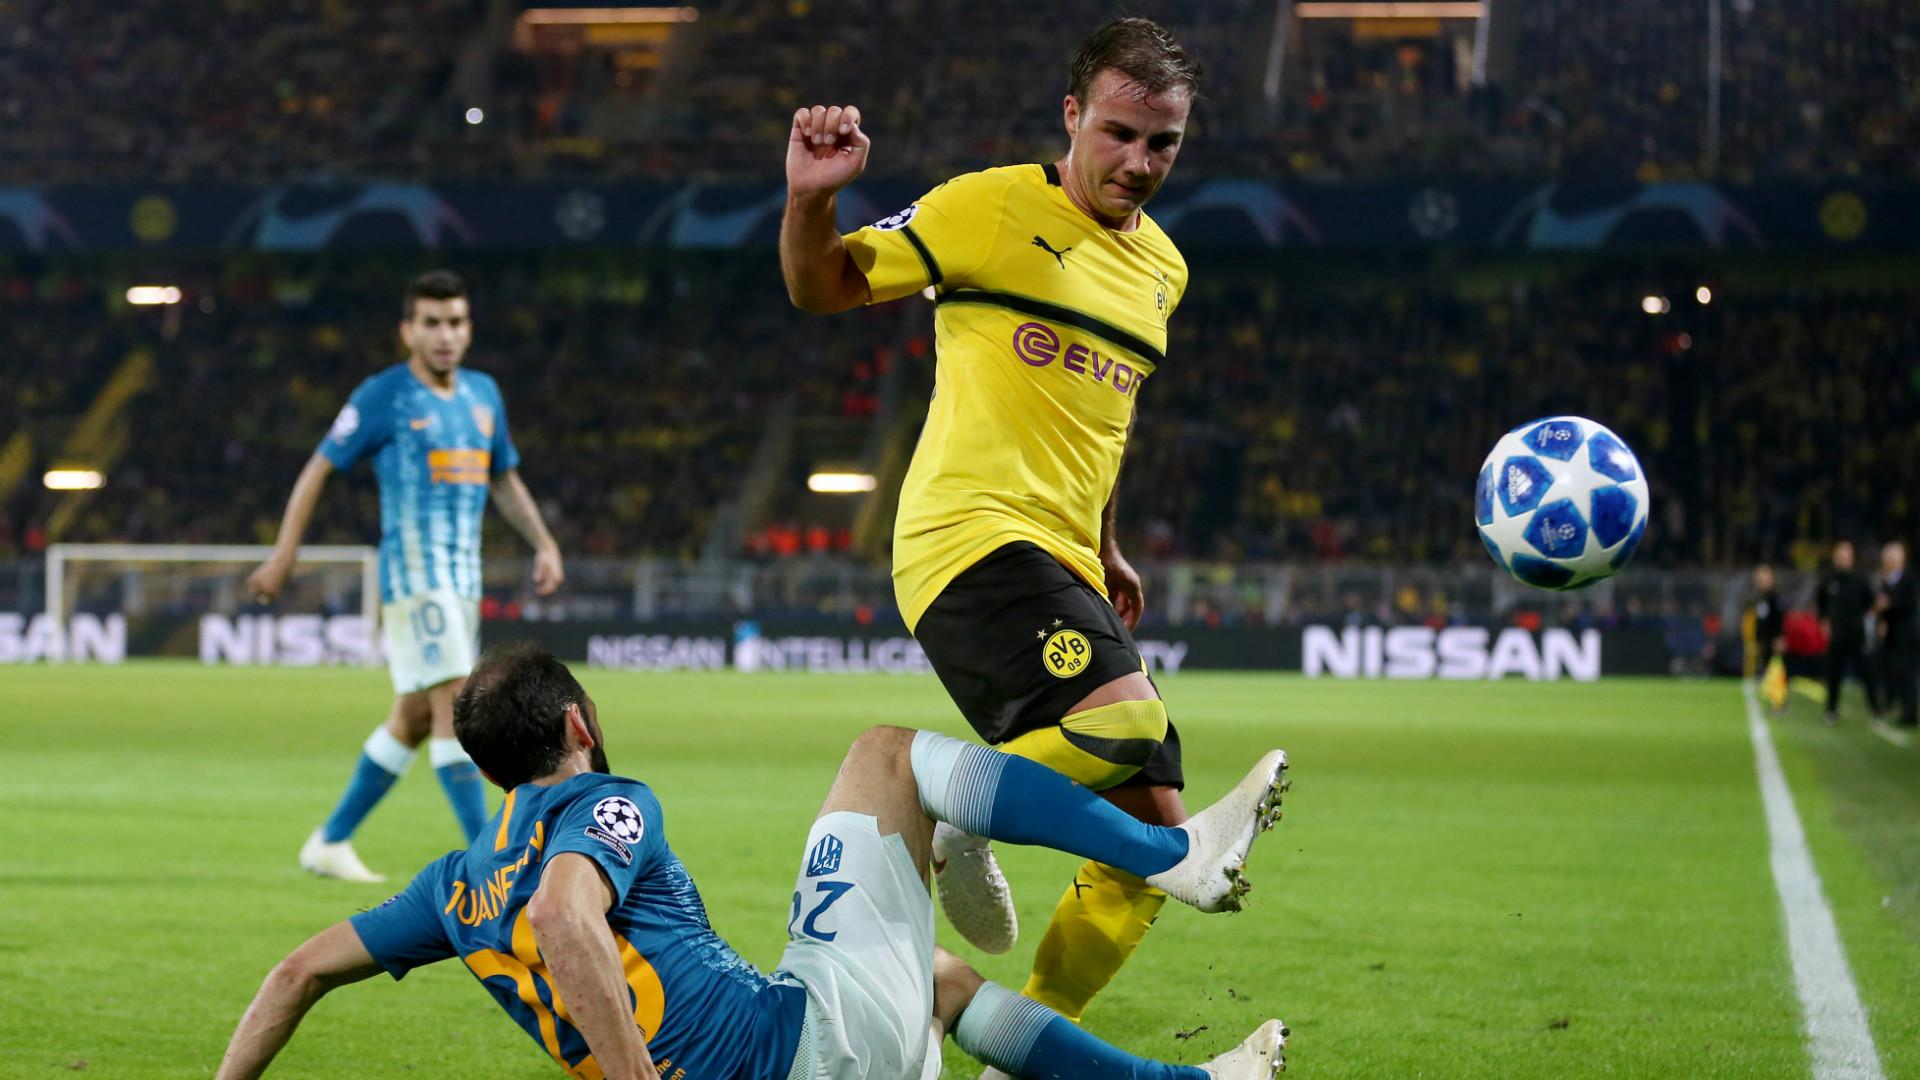 Atletico Vs Bvb Borussia Dortmund Fußball Heute Live Im Tv Und